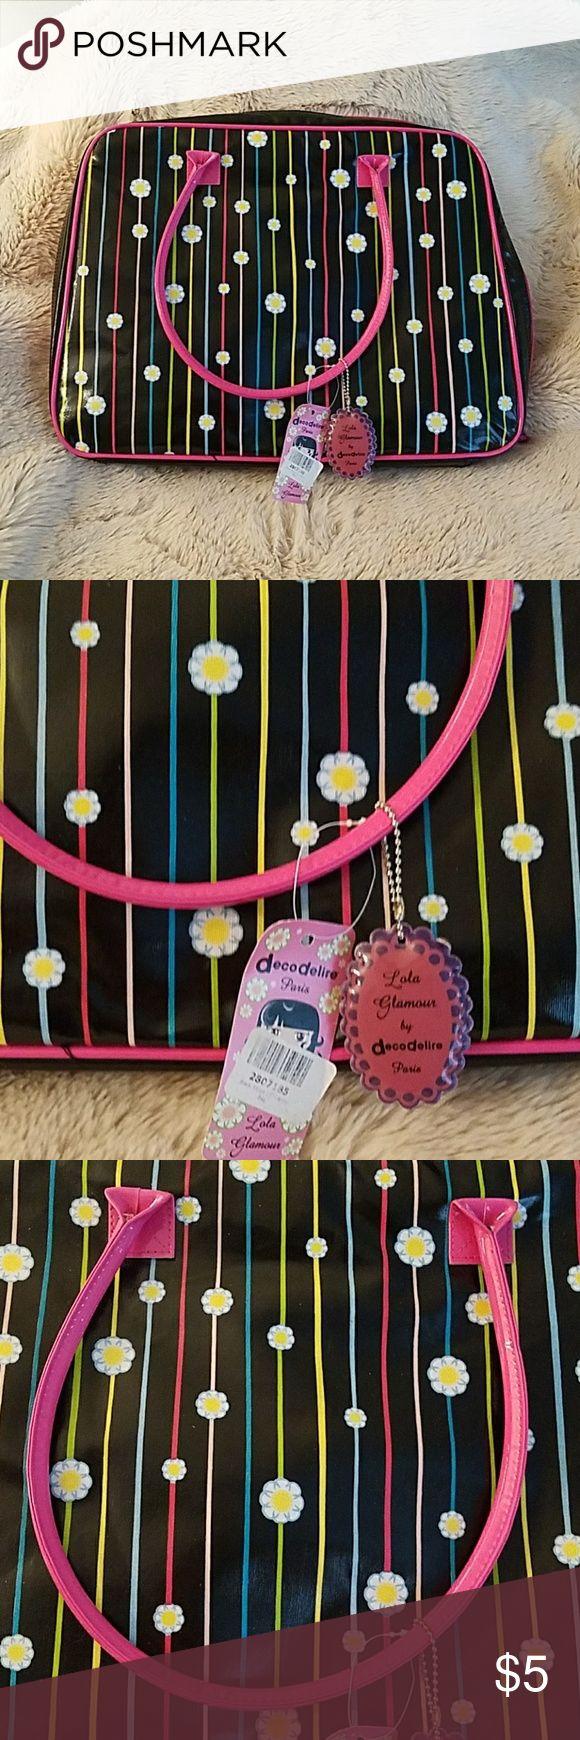 I just added this listing on Poshmark: Decodelire Flower Printed Lightweight Laptop Case. #shopmycloset #poshmark #fashion #shopping #style #forsale #decodelire #Handbags